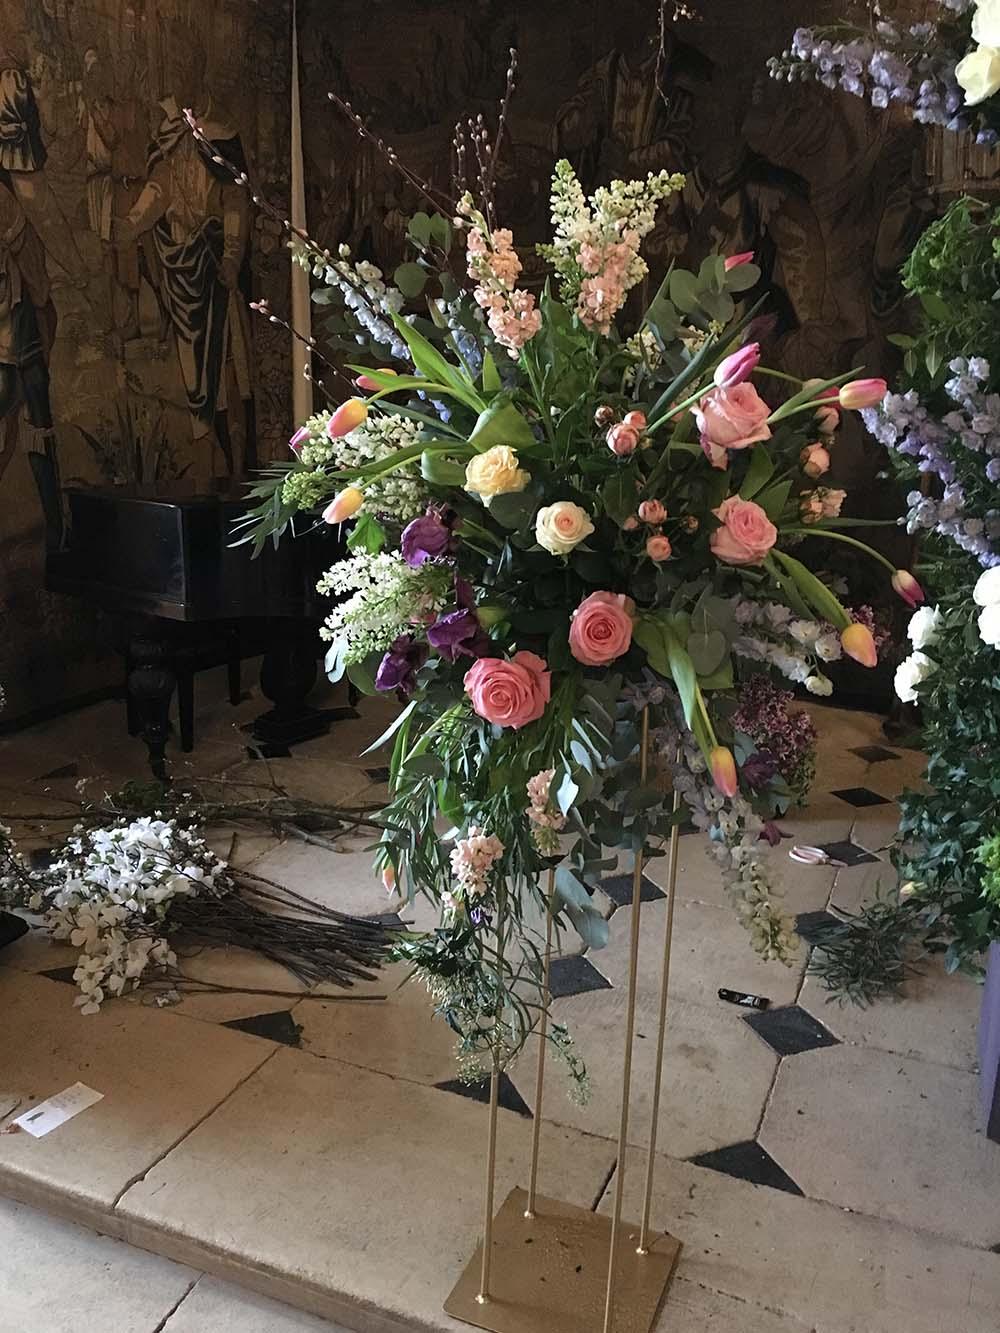 Church Floral Pedestal Display Driftwood Flowers